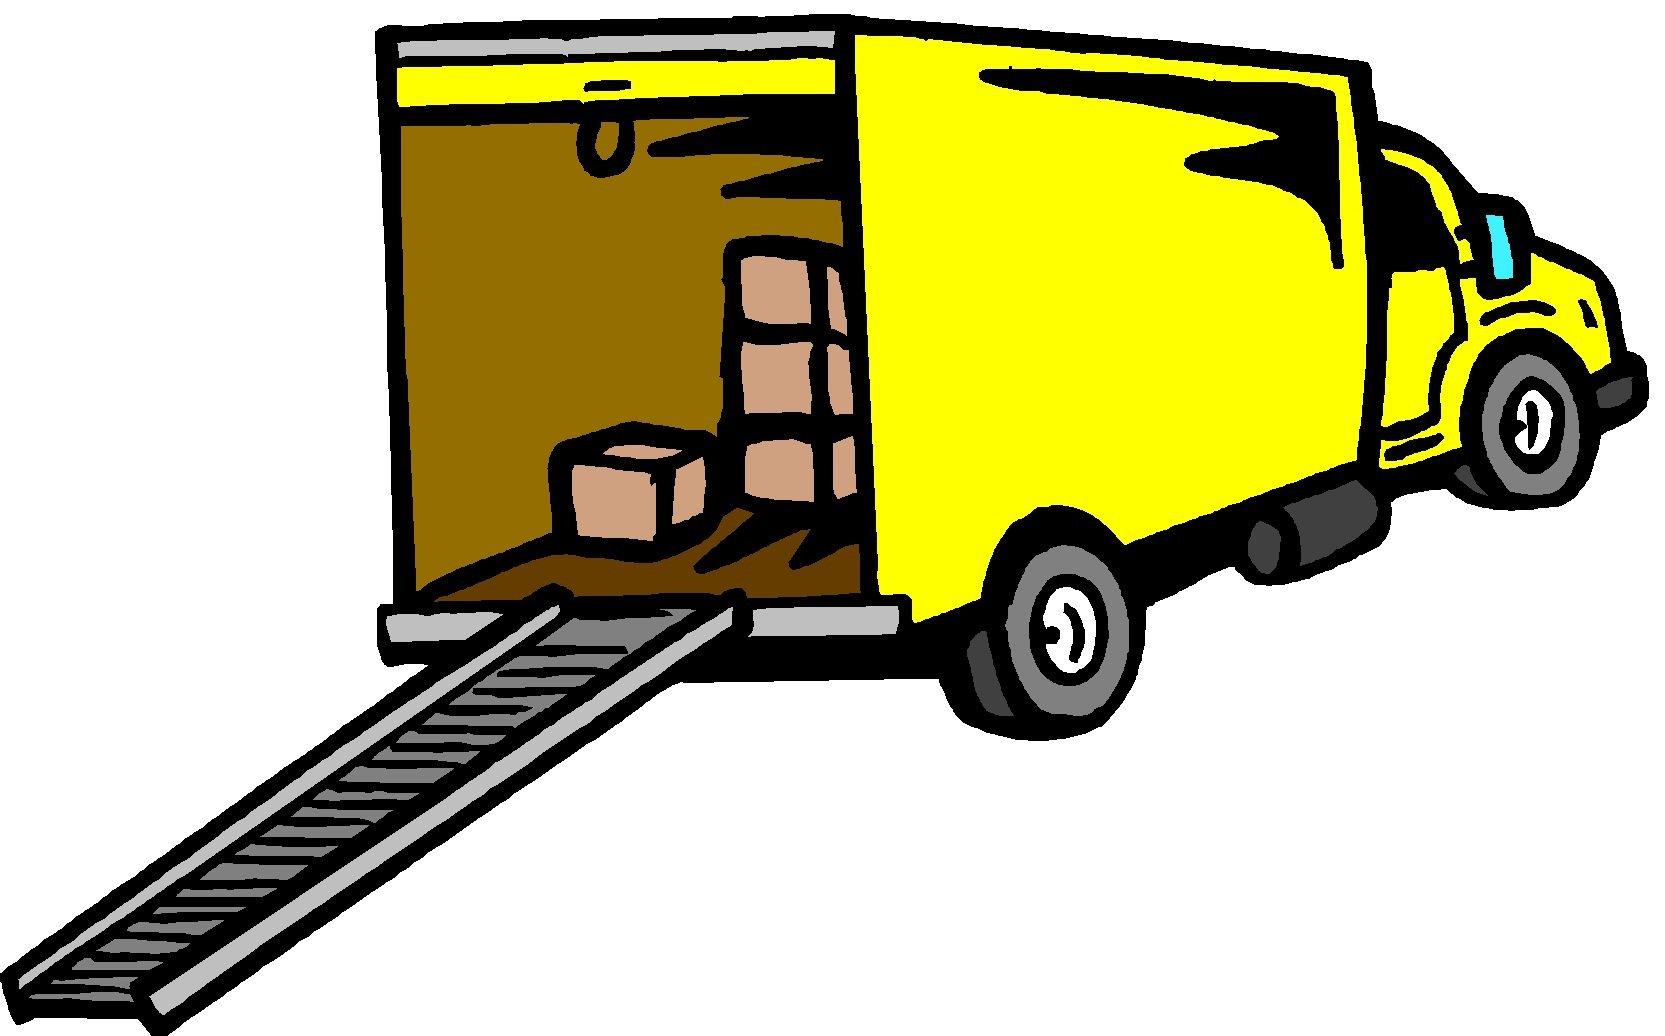 Edcabdbf4efeacc moving truck clipart.